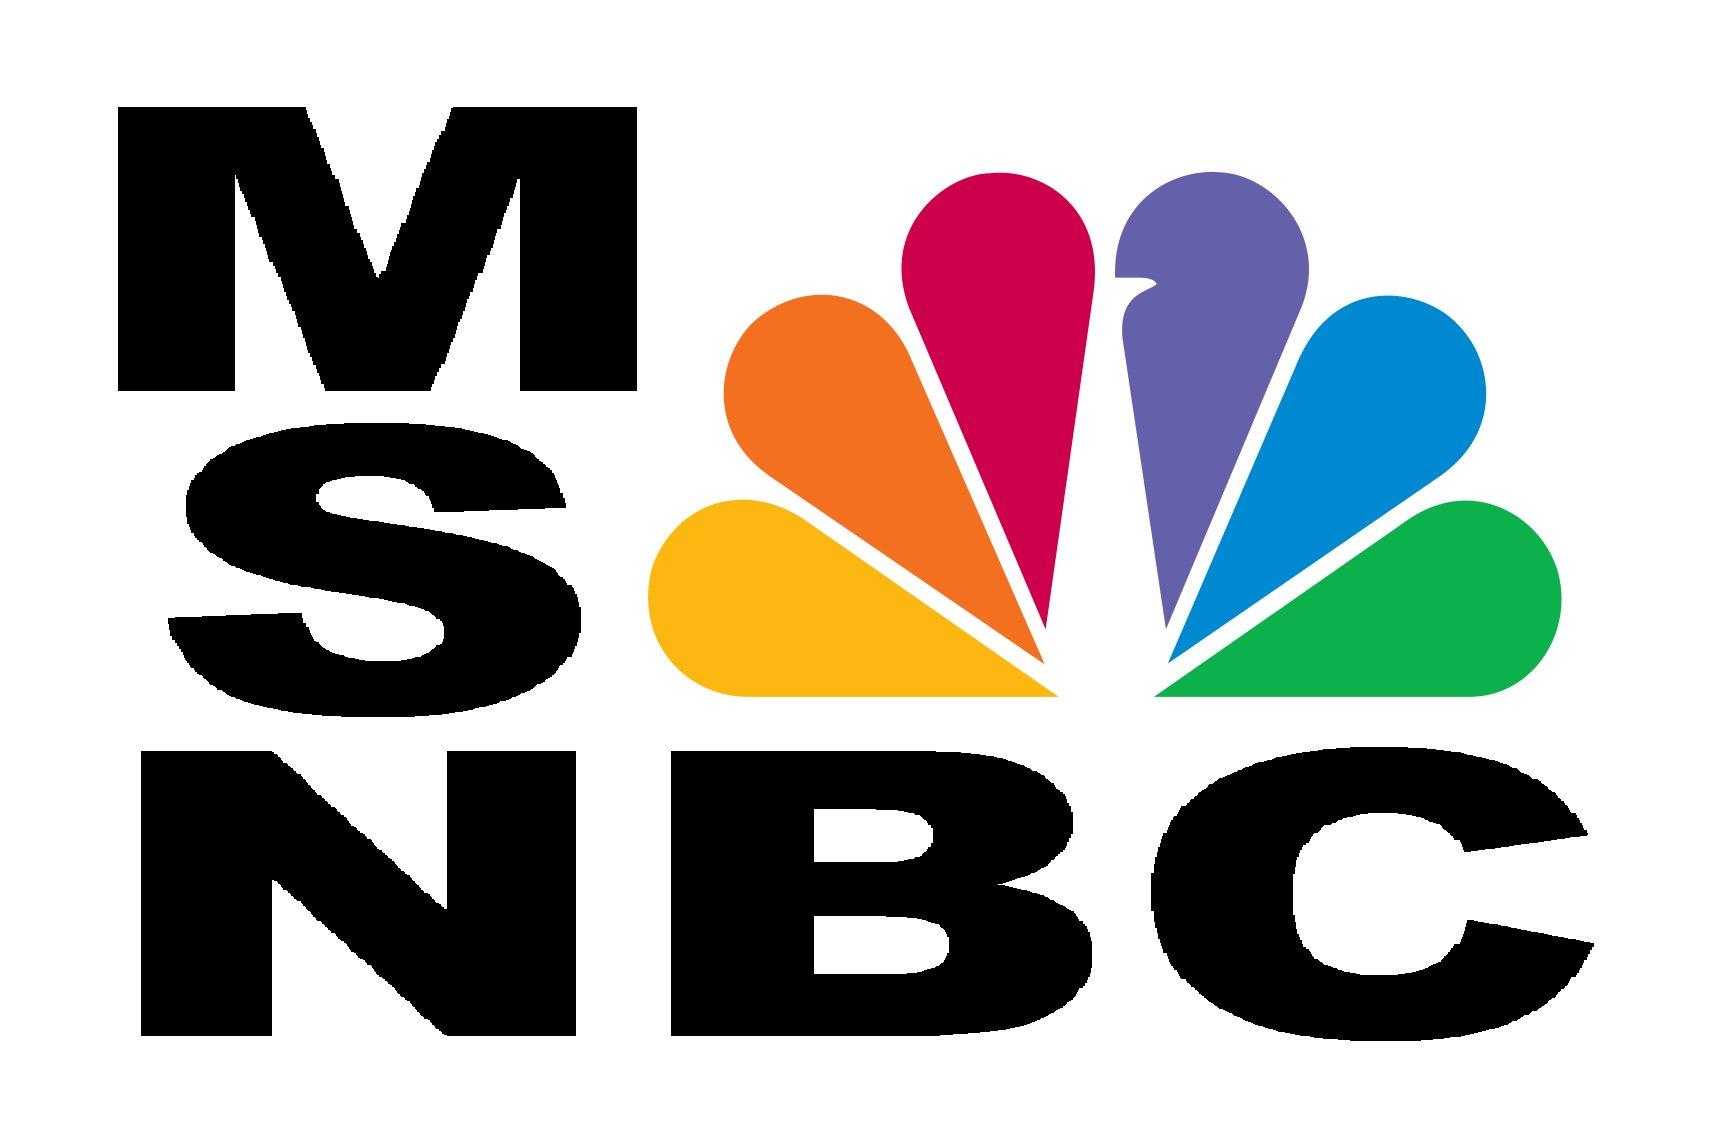 Msnbc picture: MSNBC Logo jpg (fontmeme pluspng.com) Msnbc picture: KCQAV5nf jpg  (pbs.twimg pluspng.com) Msnbc picture: MSNBC logo png (wikimedia pluspng.com) - Msnbc Logo PNG